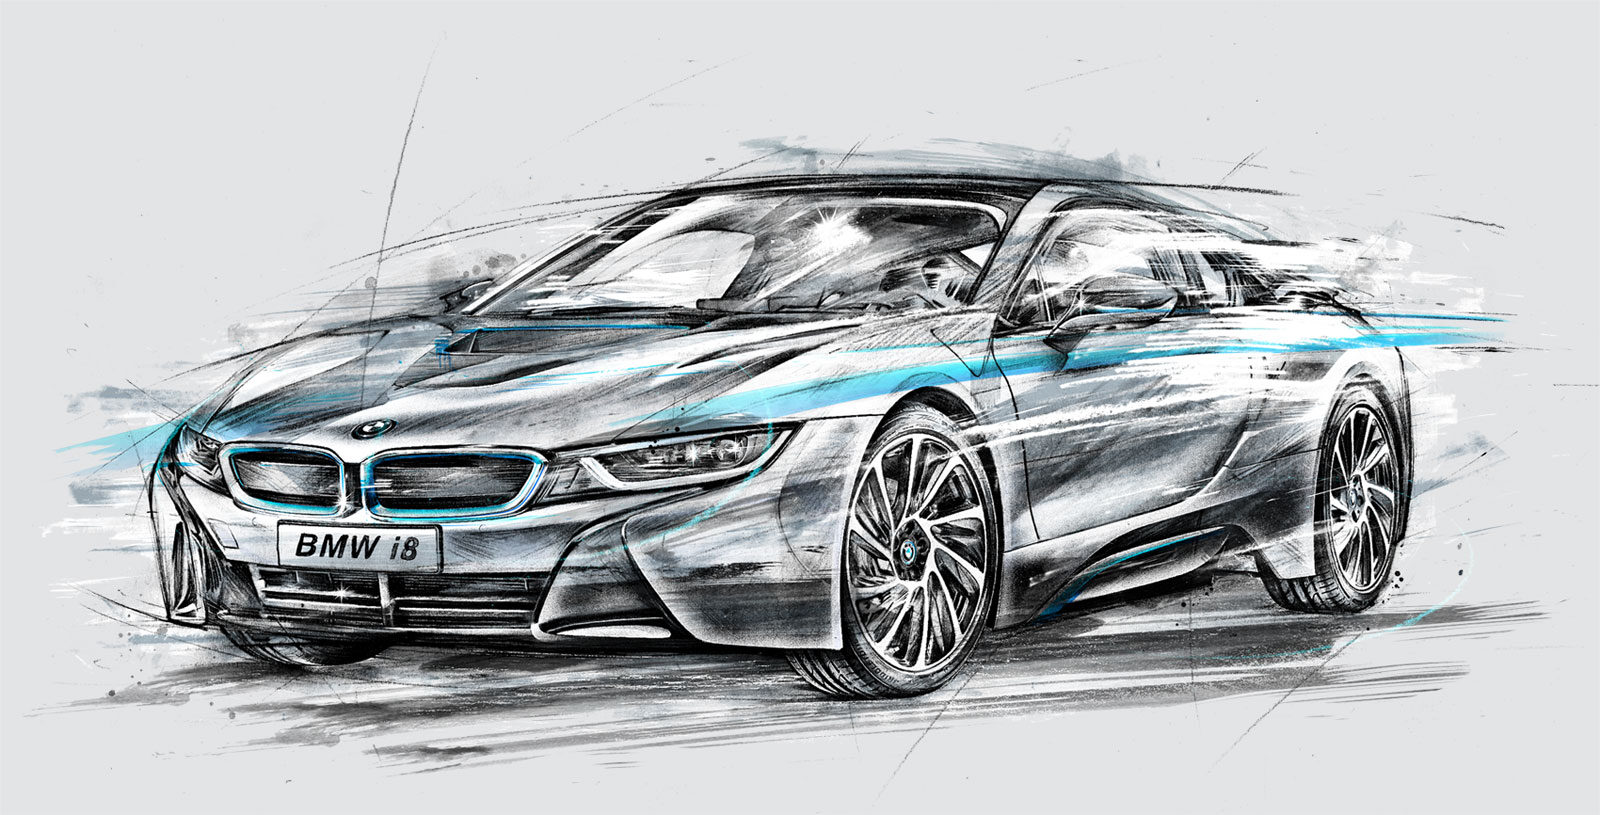 BMW i8 - Kornel Illustration   Kornel Stadler portfolio